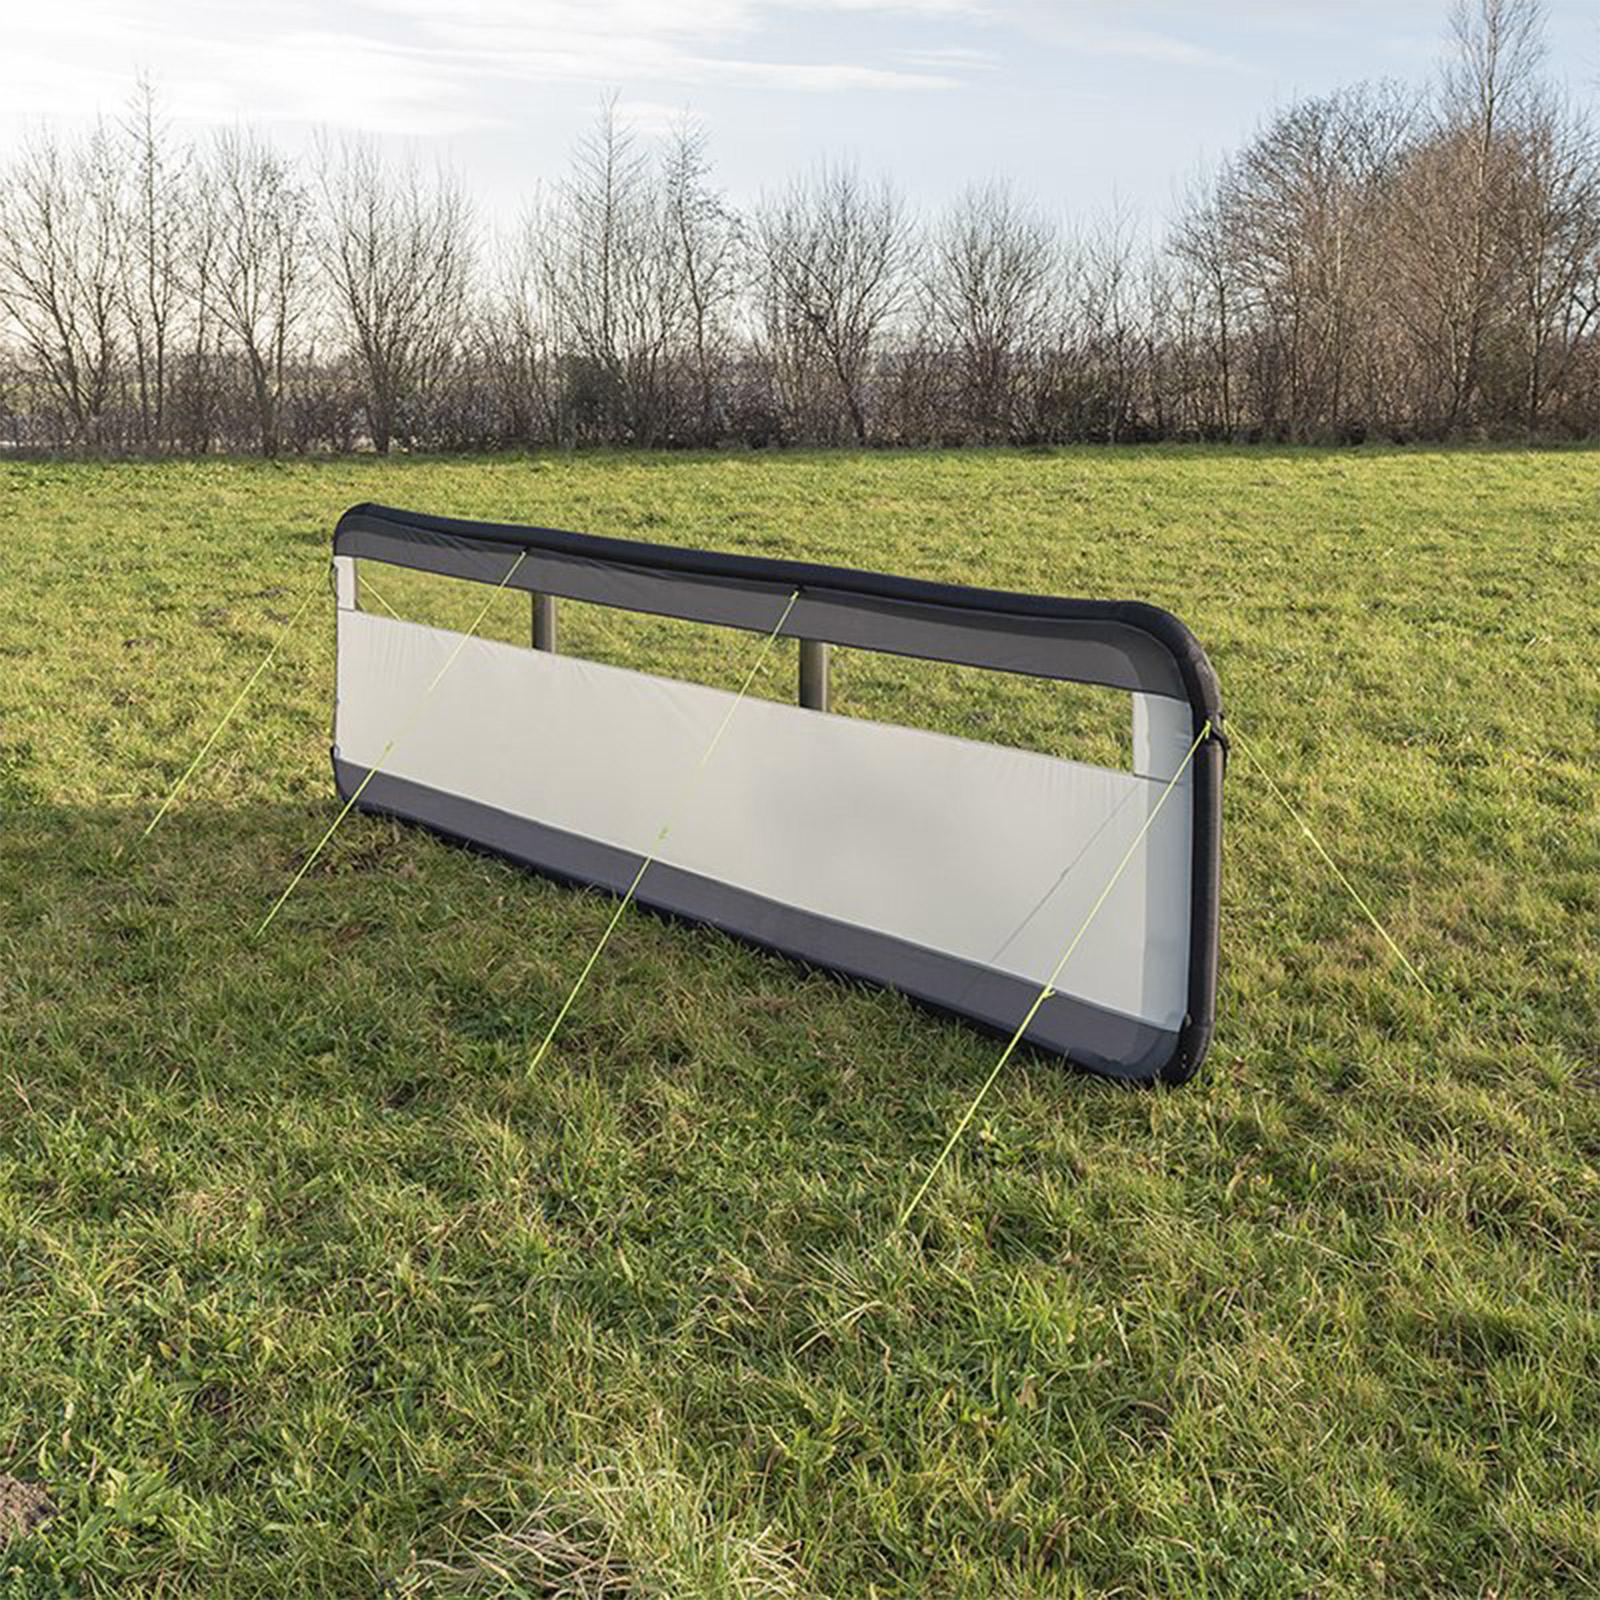 Windschutz Windbarikade aufblasbar | 150D Polyester | 480x140 cm | grau